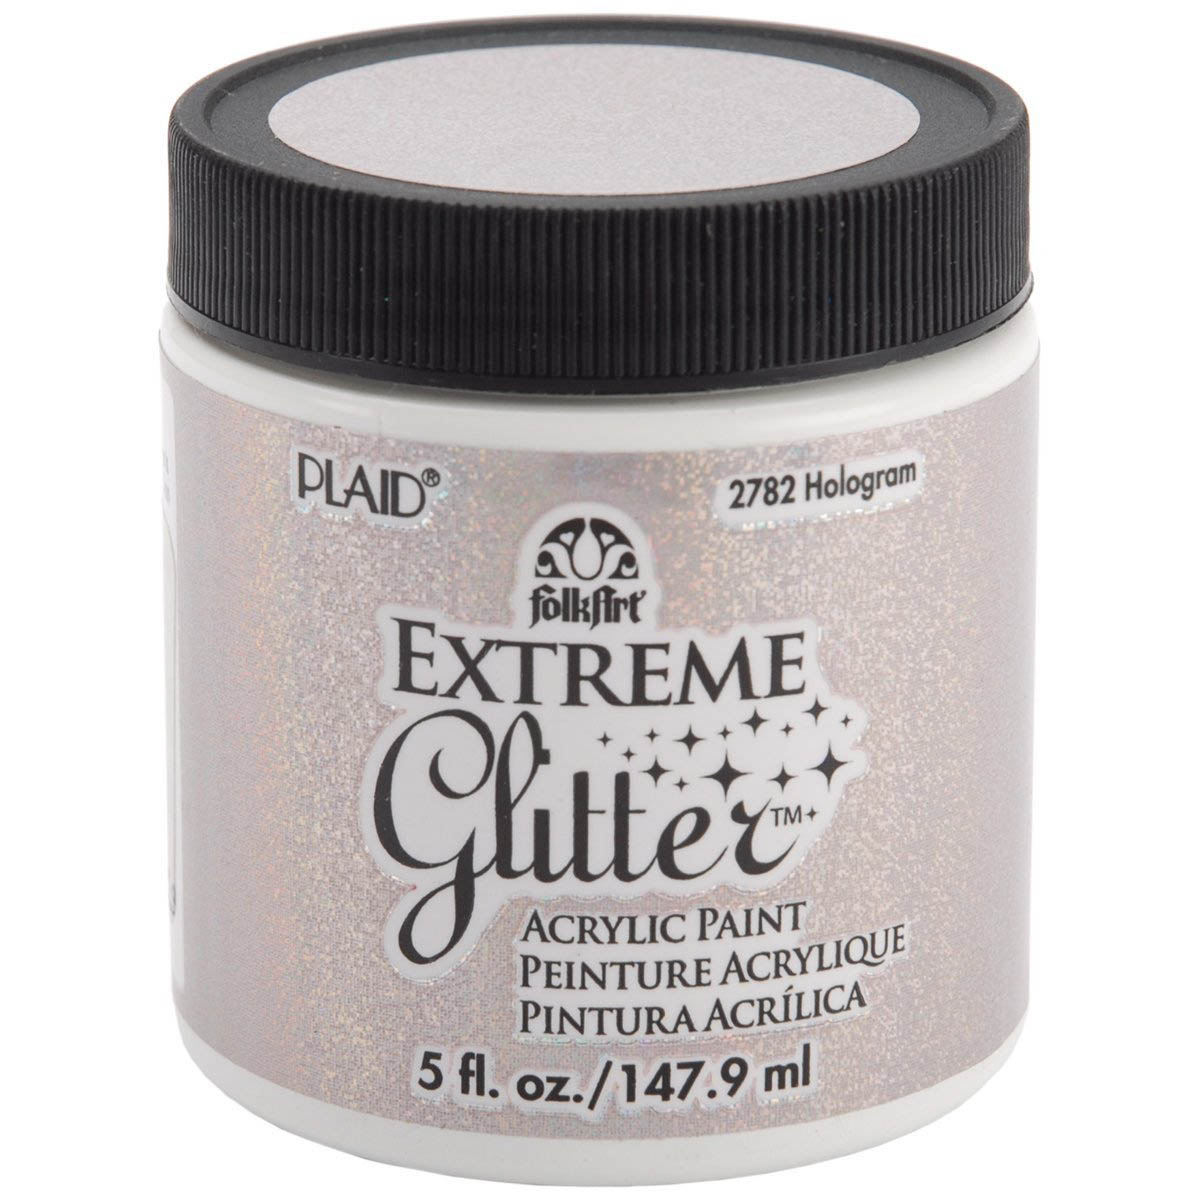 FolkArt ® Extreme Glitter™ - Hologram, 5 oz. - 2782